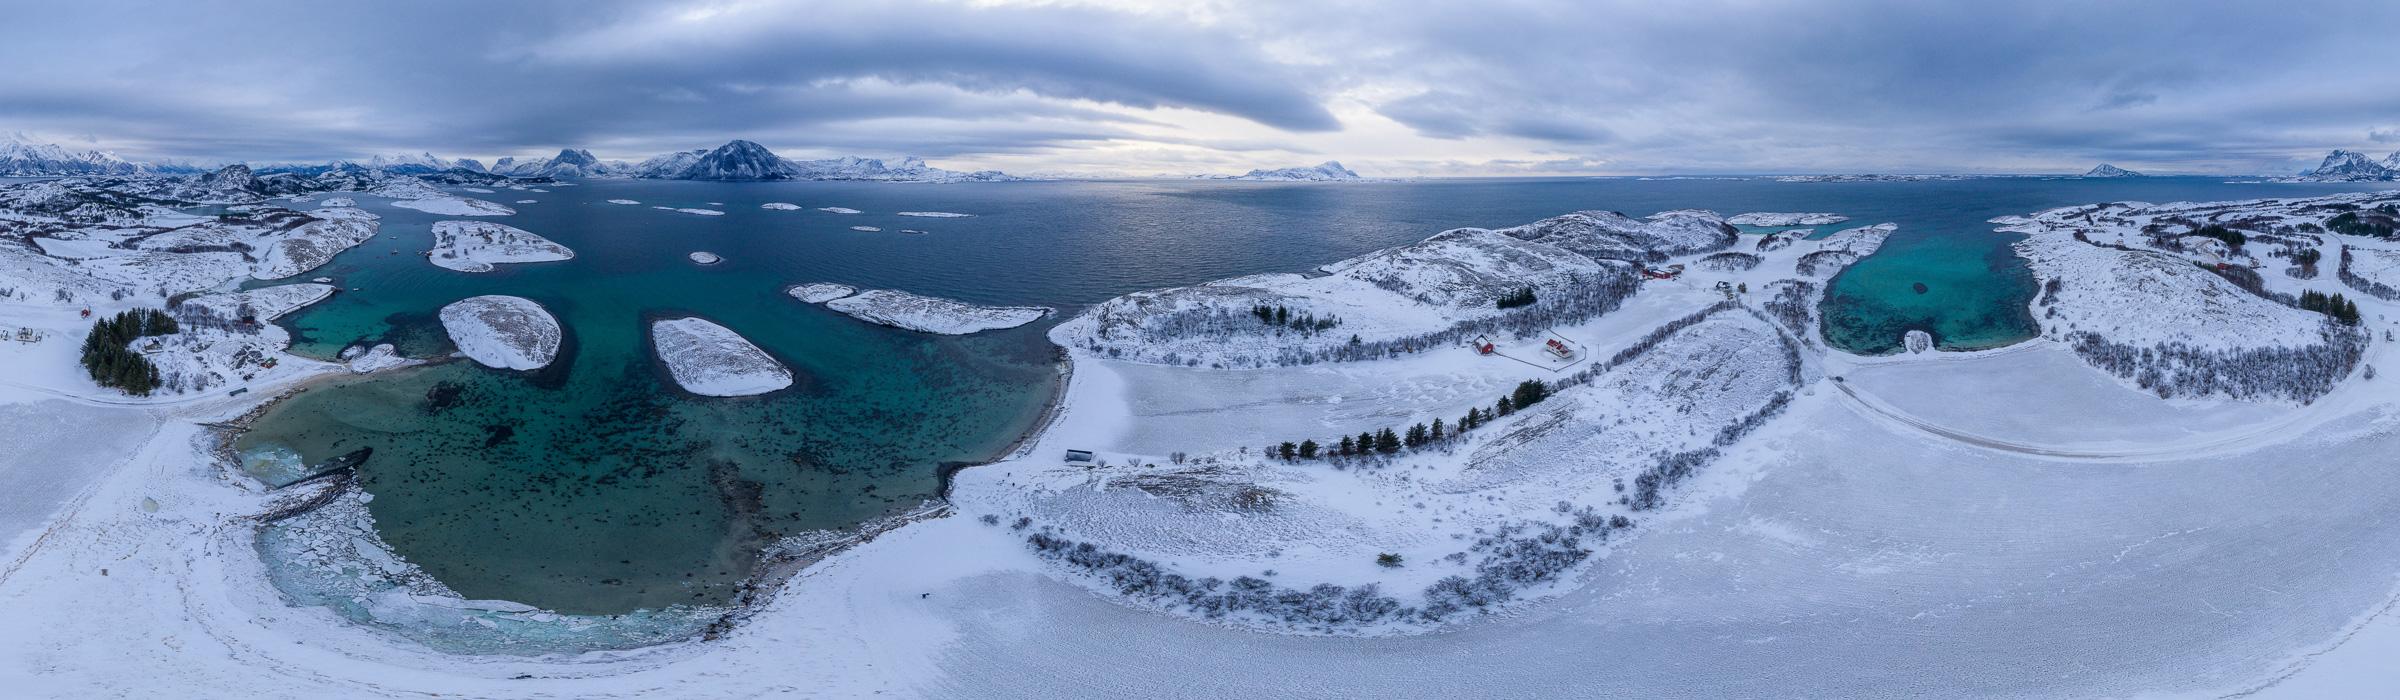 Drohnenpanorama vom eisigen Tjongsfjord